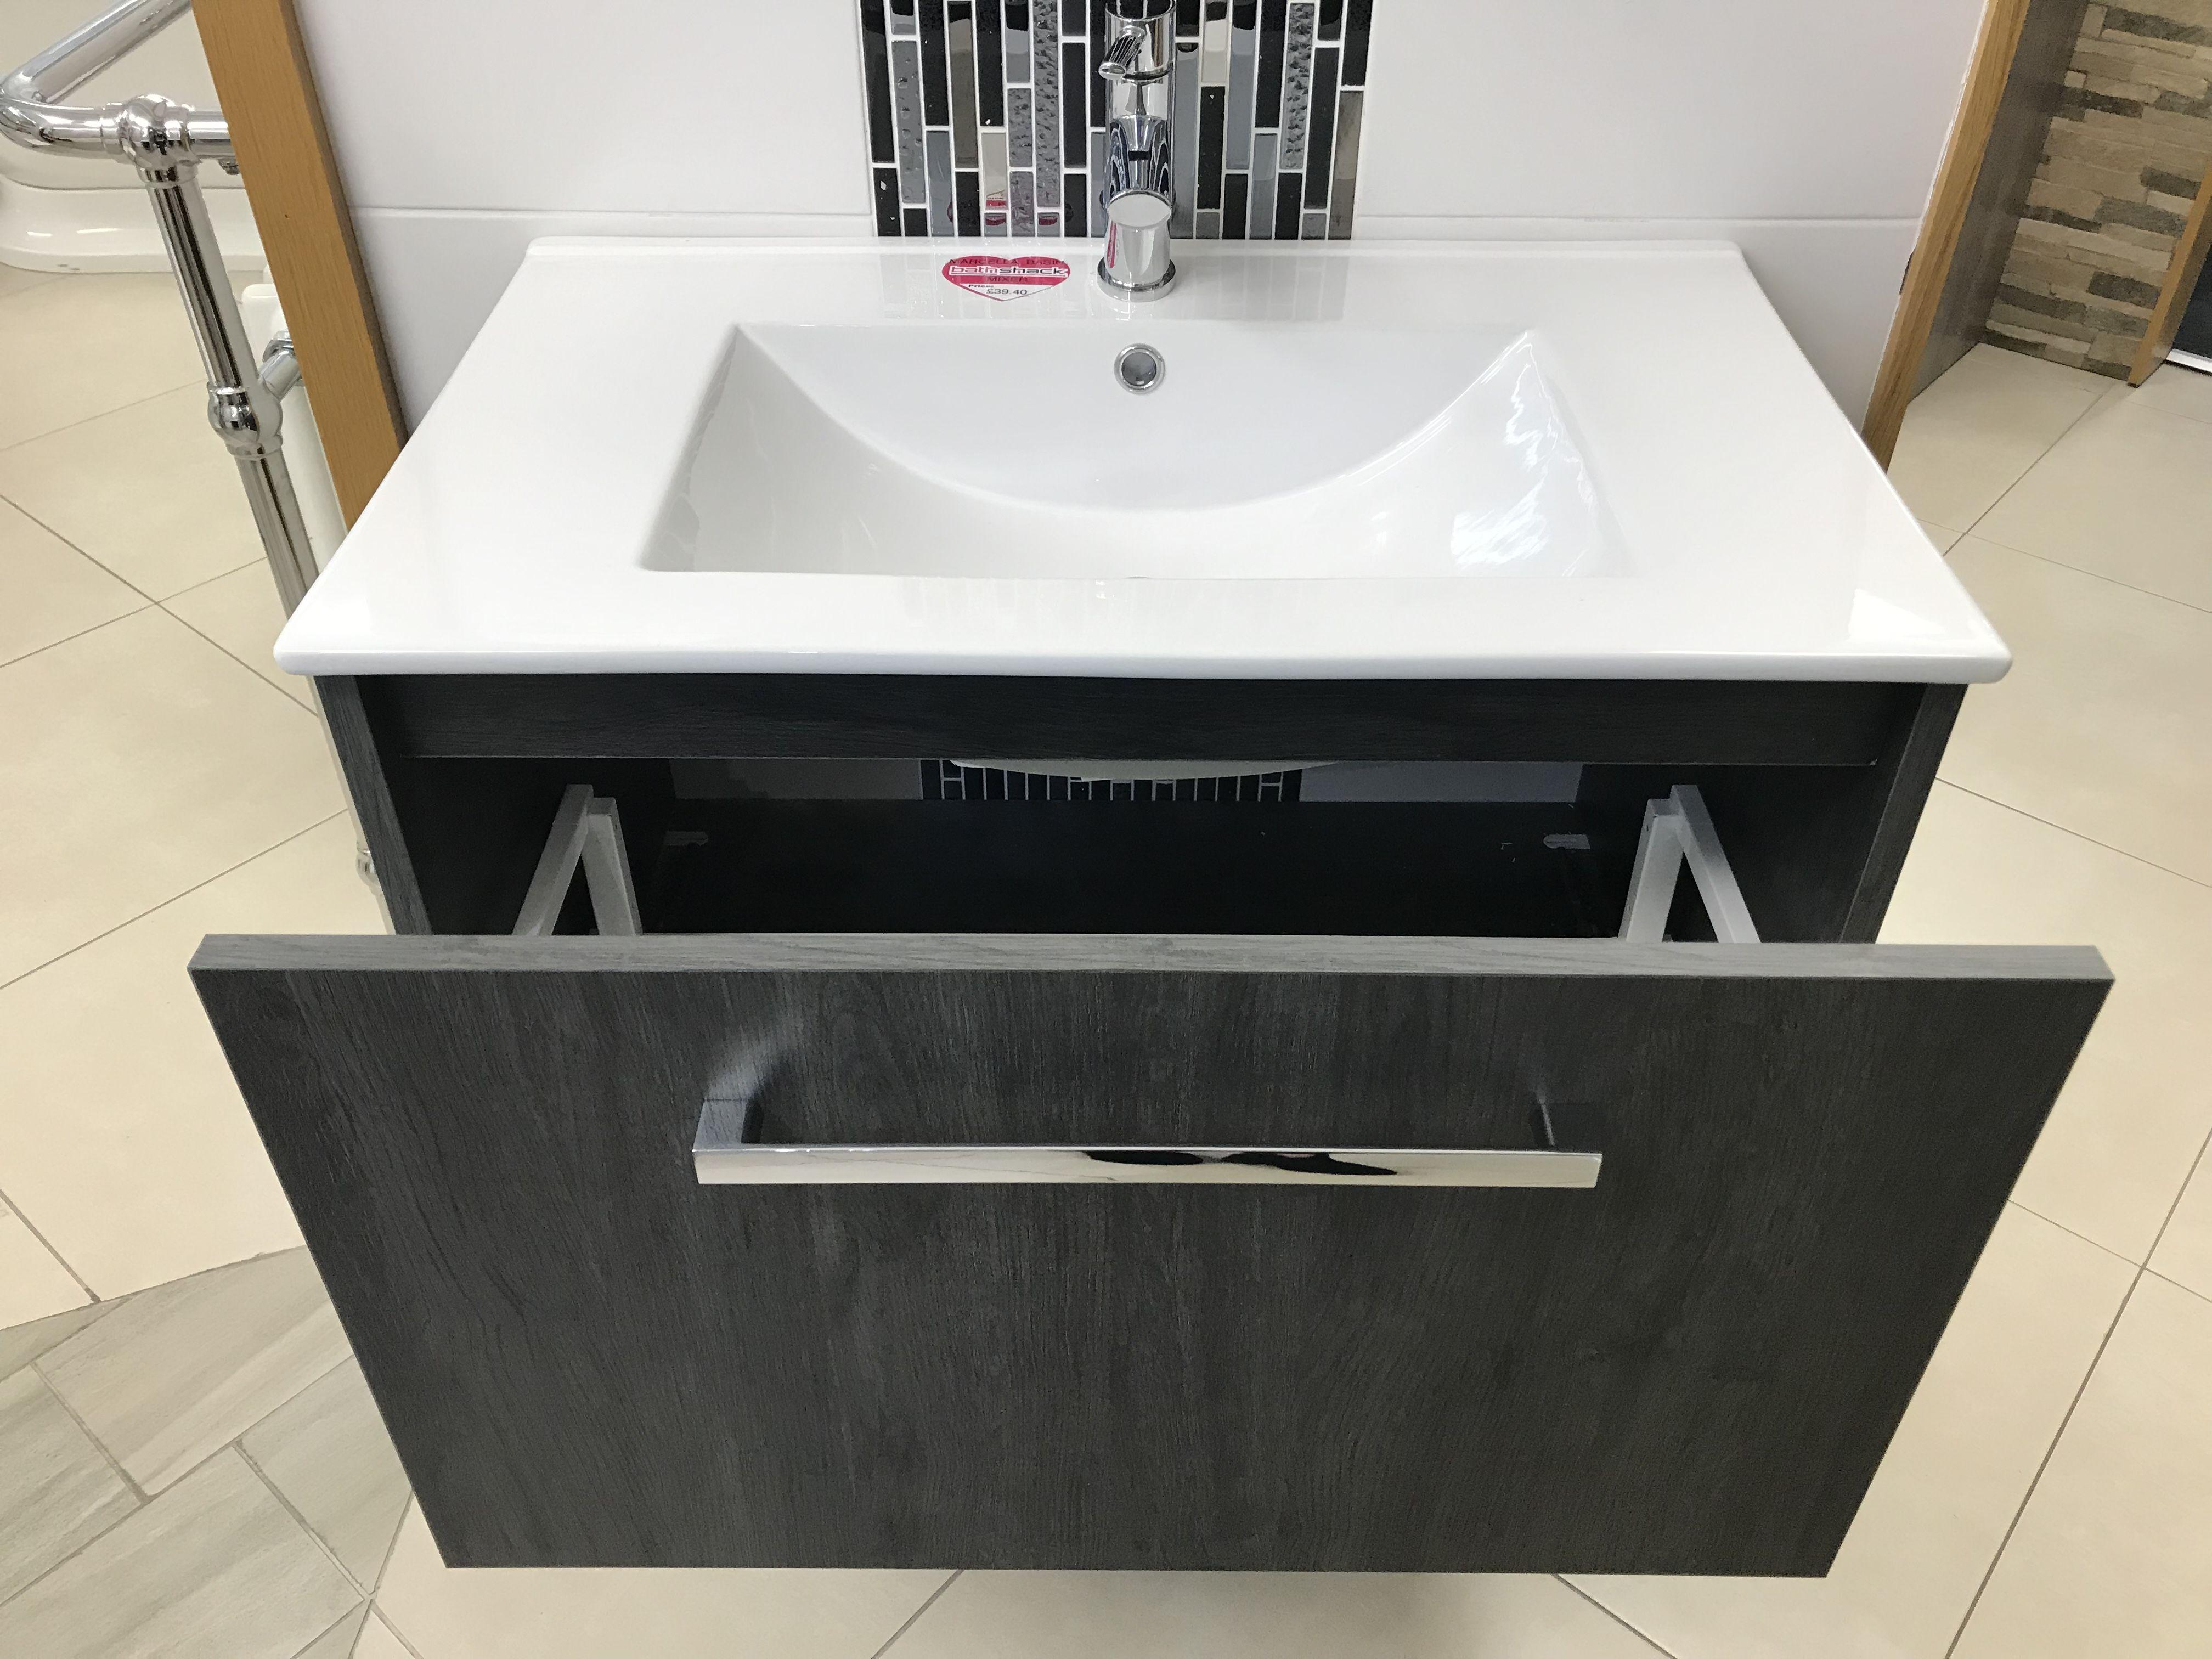 Bespoke Bathroom Cabinet Greenwood Joinery Trustedpeople Ie Bespoke Bathroom Bathroom Design Bathroom Design Decor